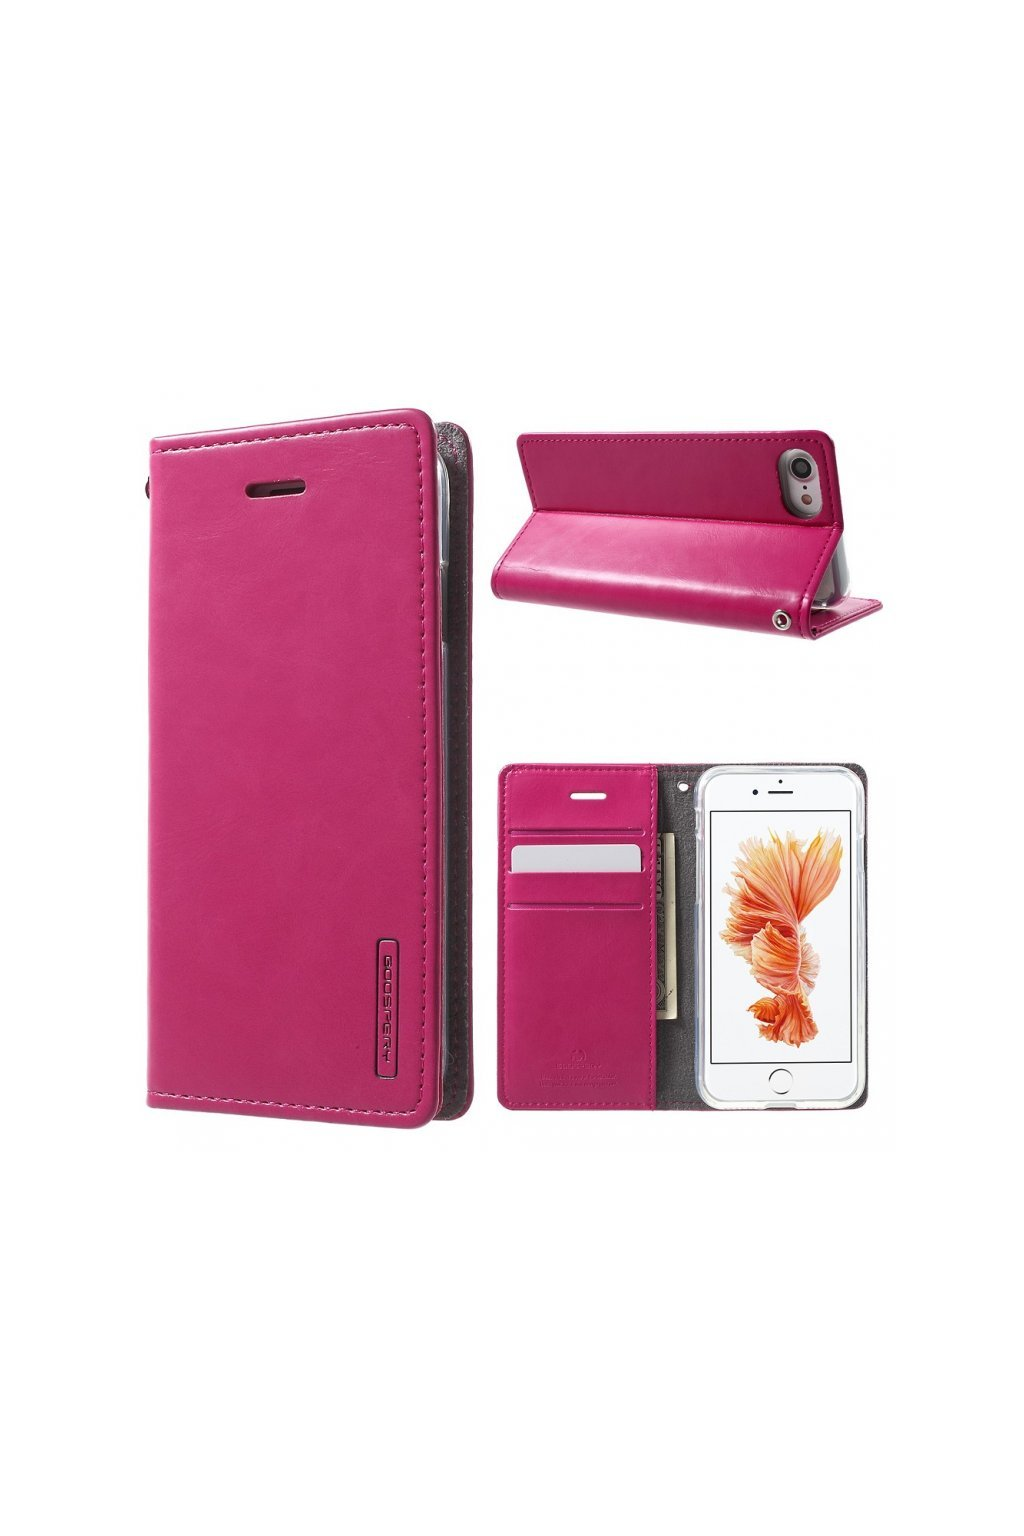 7319 pouzdro kryt pro iphone 7 8 mercury bluemoon flip hotpink